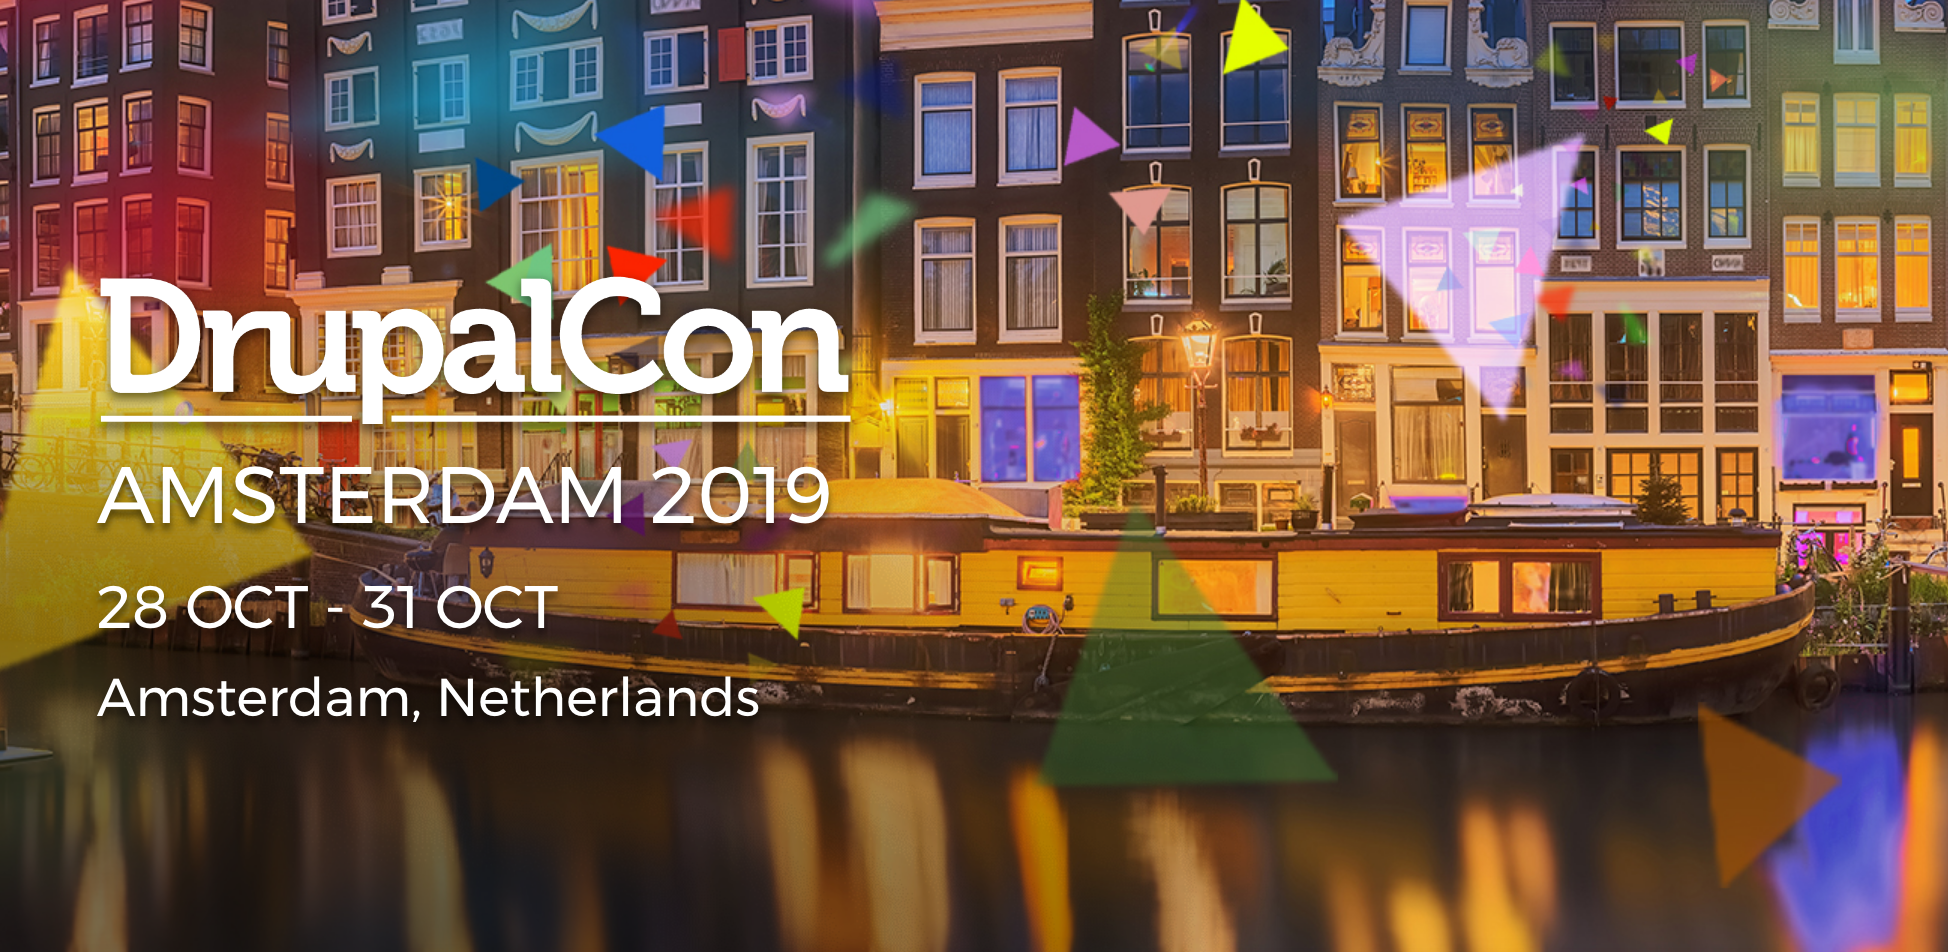 DrupalCon Amsterdam 2019. 28 OCT - 31 OCT. Amsterdam, Netherlands